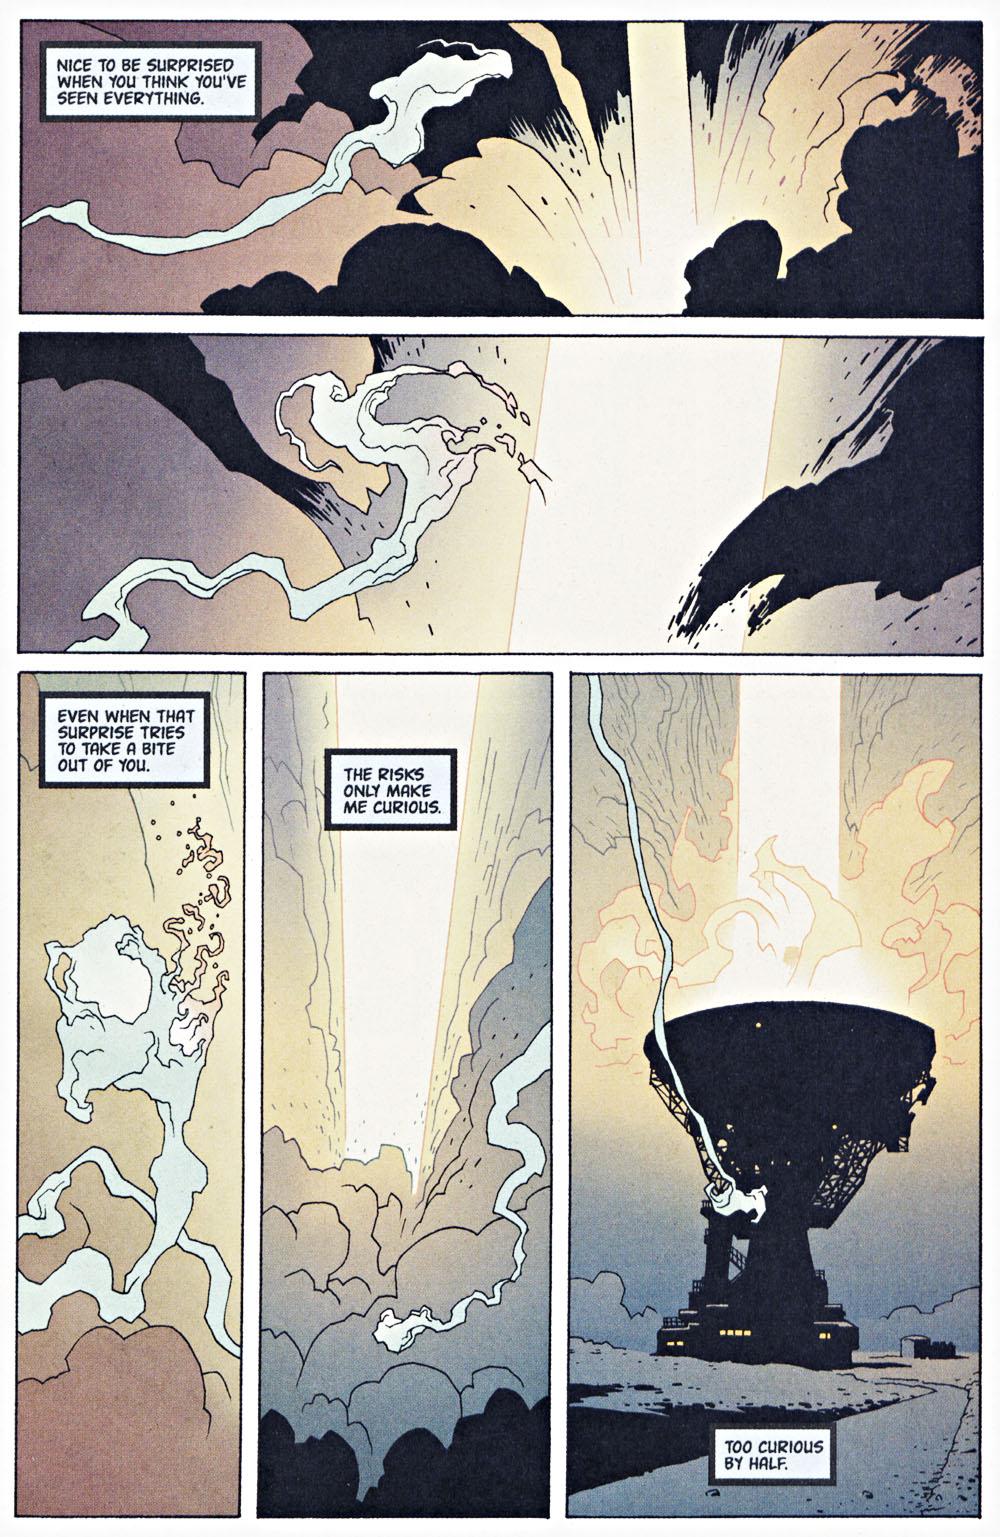 Read online Hellboy: Weird Tales comic -  Issue #7 - 21